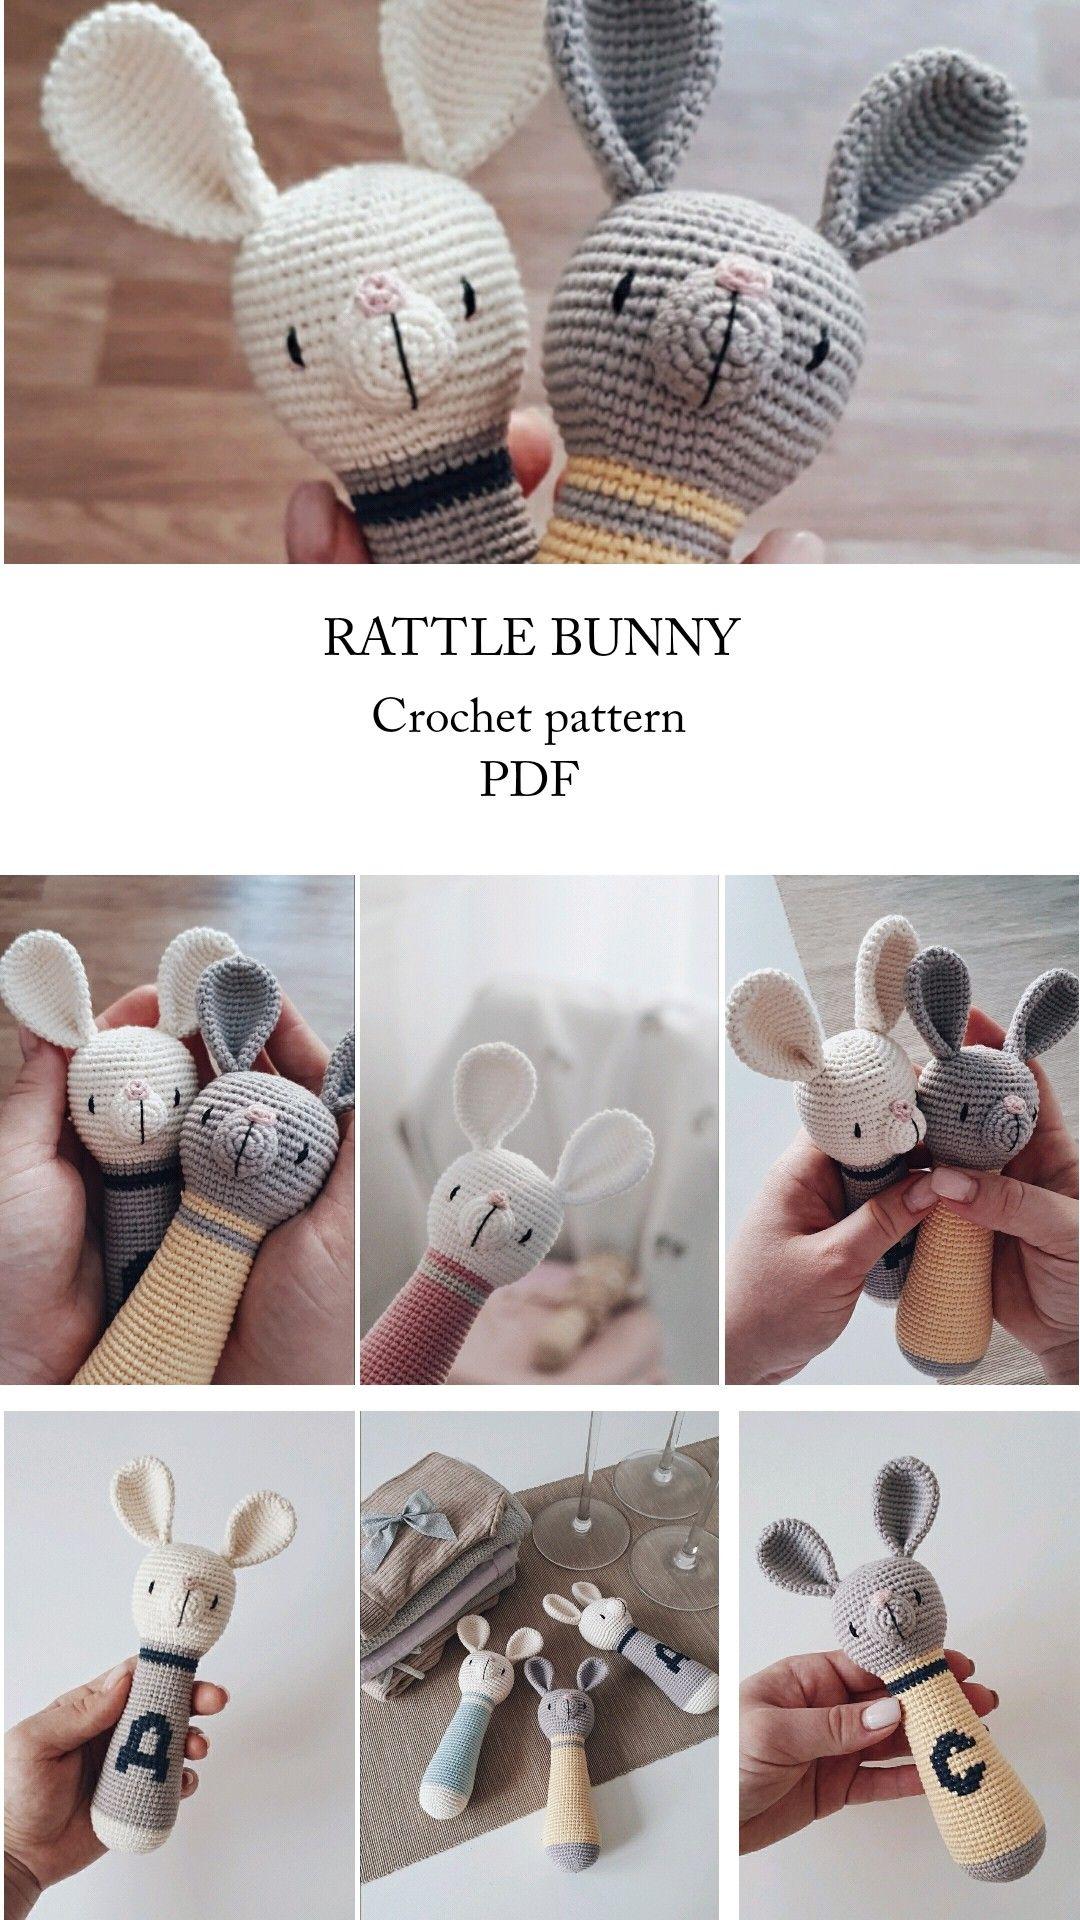 Crochet Pattern Rattle Bunny Tutorial Pdf File Amigurumi Pattern Crochet Toys Pattern Rabbit Gift For Baby Pattern Bunny Rabbit Toy In 2020 Crochet Patterns Crochet Toys Patterns Crochet Basics